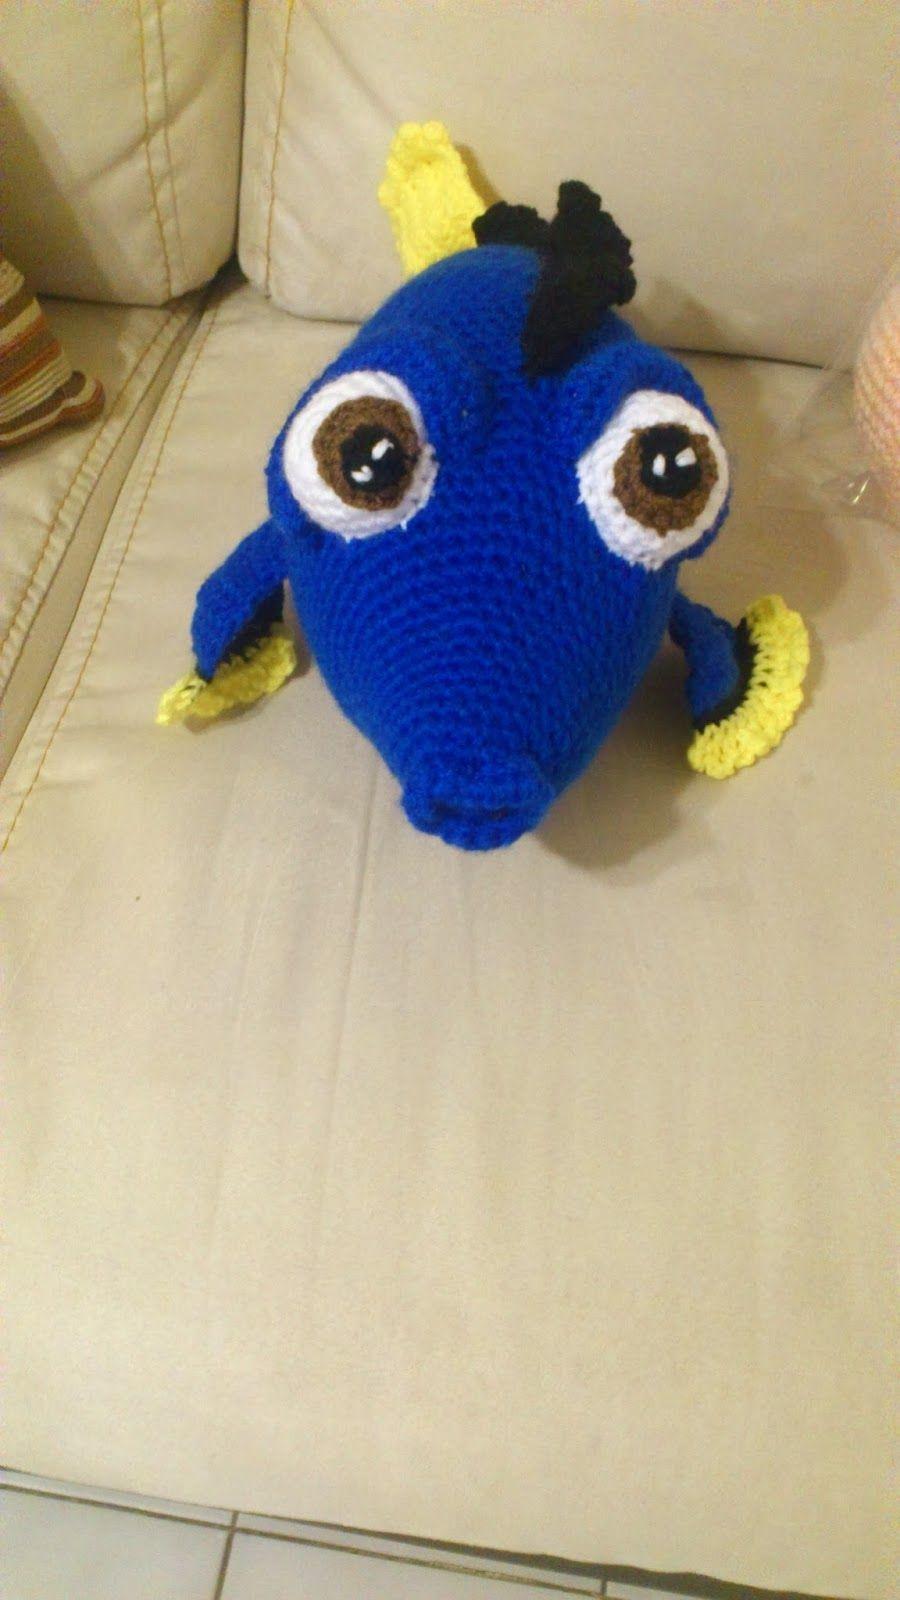 NOVEDADES JENPOALI | Cute crochet | Pinterest | Personajes de nemo ...